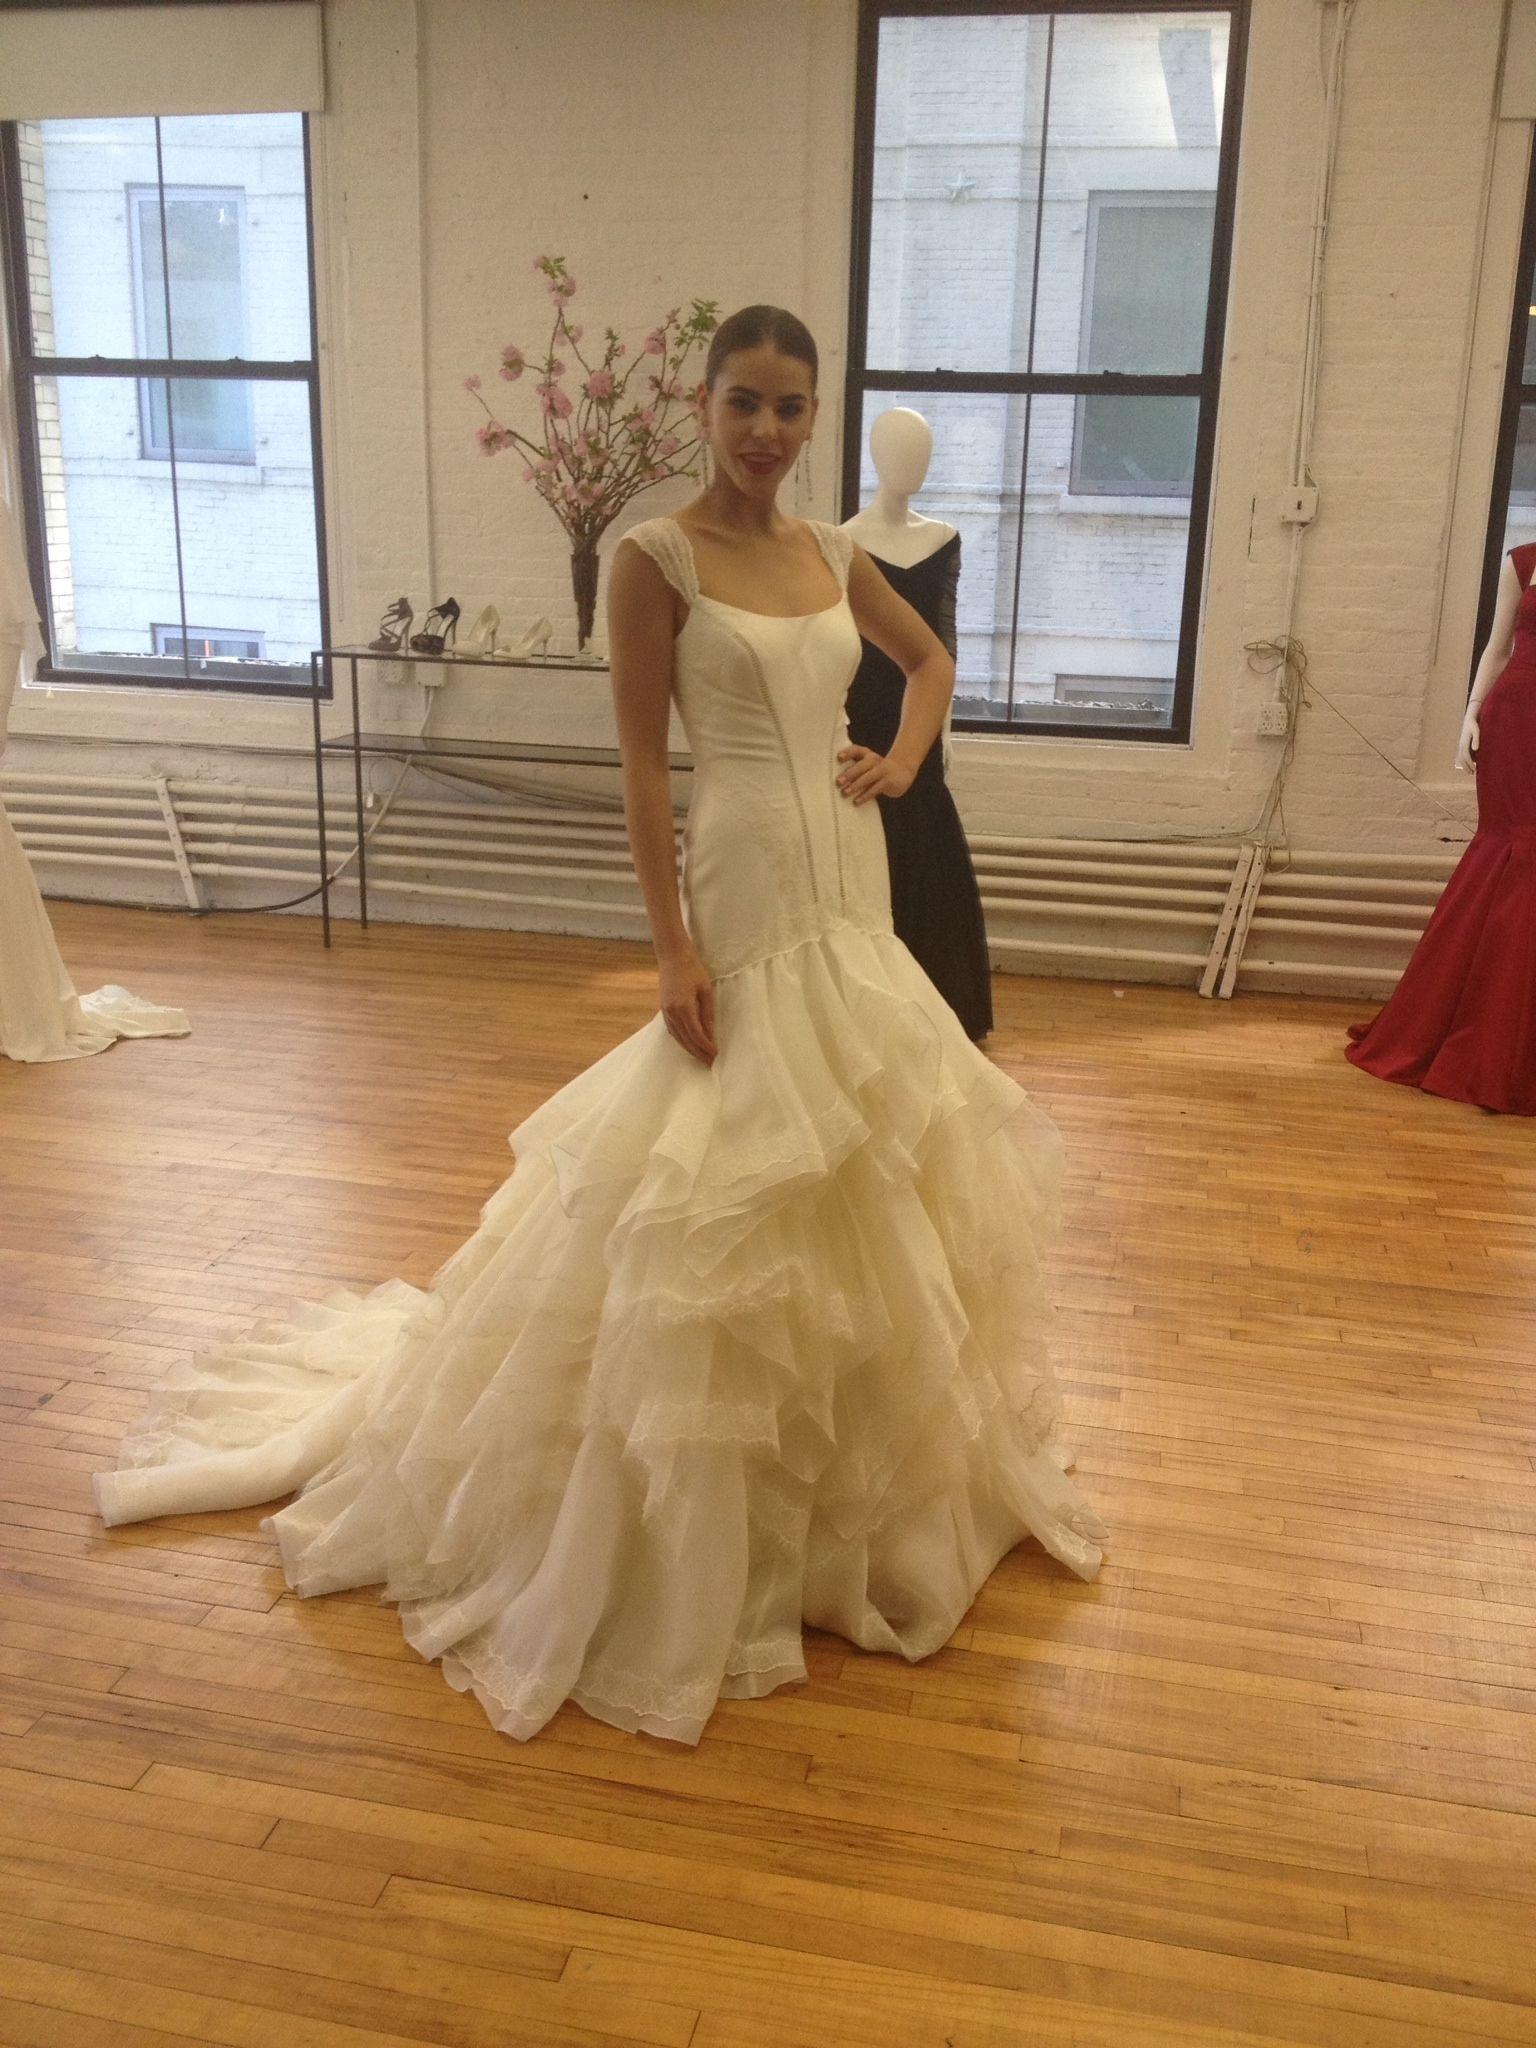 Zac Posen Wedding Dresses Best Shapewear For Wedding Dress Check More At Http Svesty Co Shapewear For Wedding Dress Zac Posen Wedding Dress Wedding Dresses [ 2048 x 1536 Pixel ]